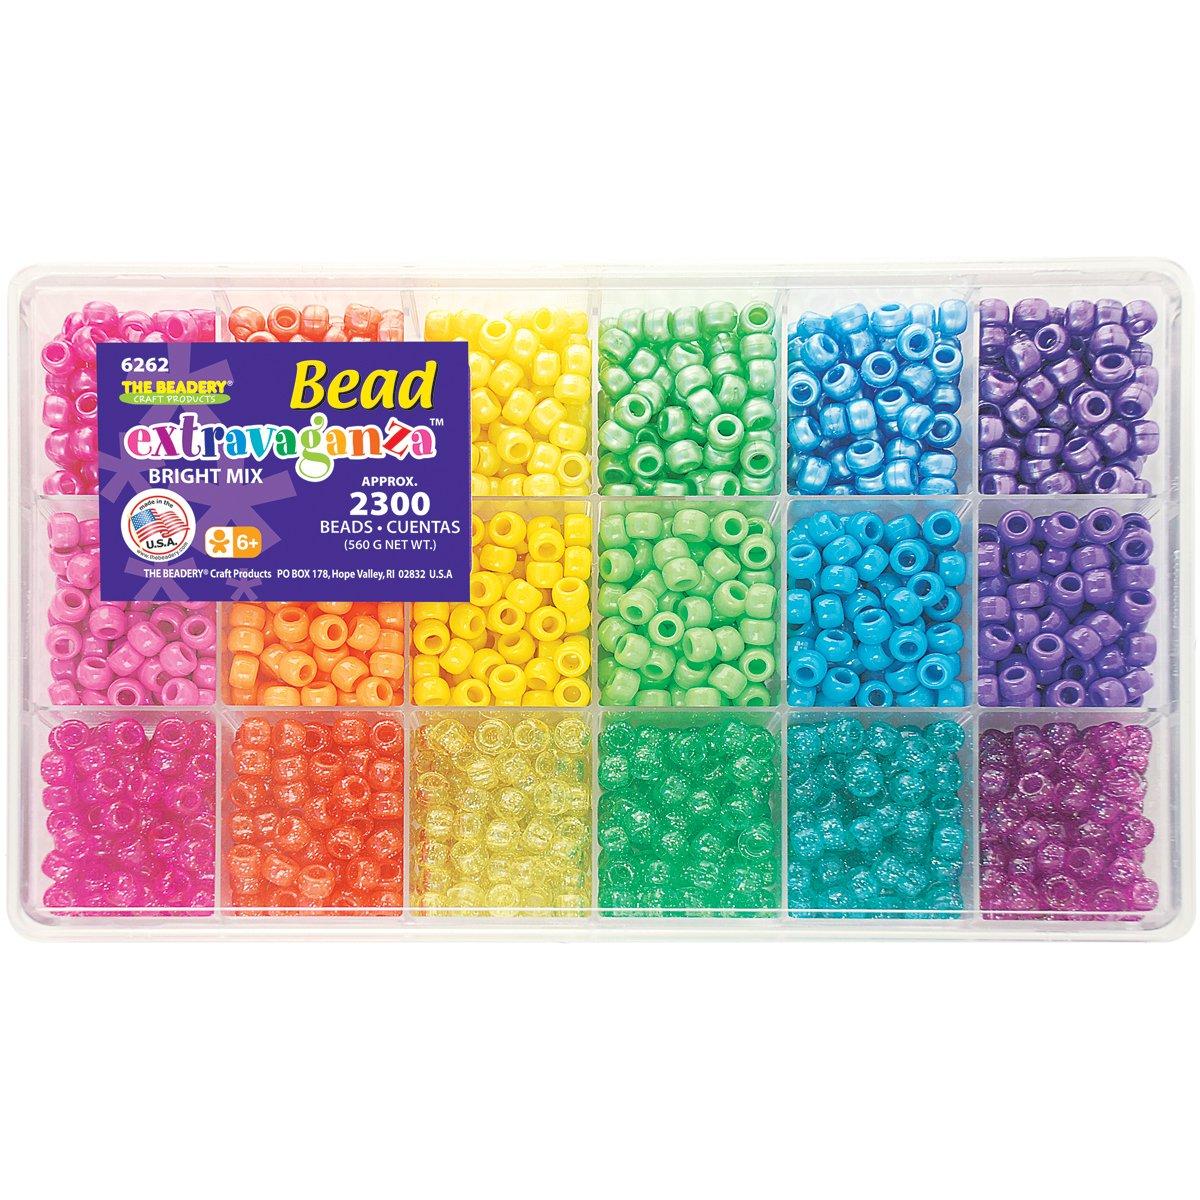 The Beadery Sparkles Pony Bead Box - approximately 2300 beads by Beadery